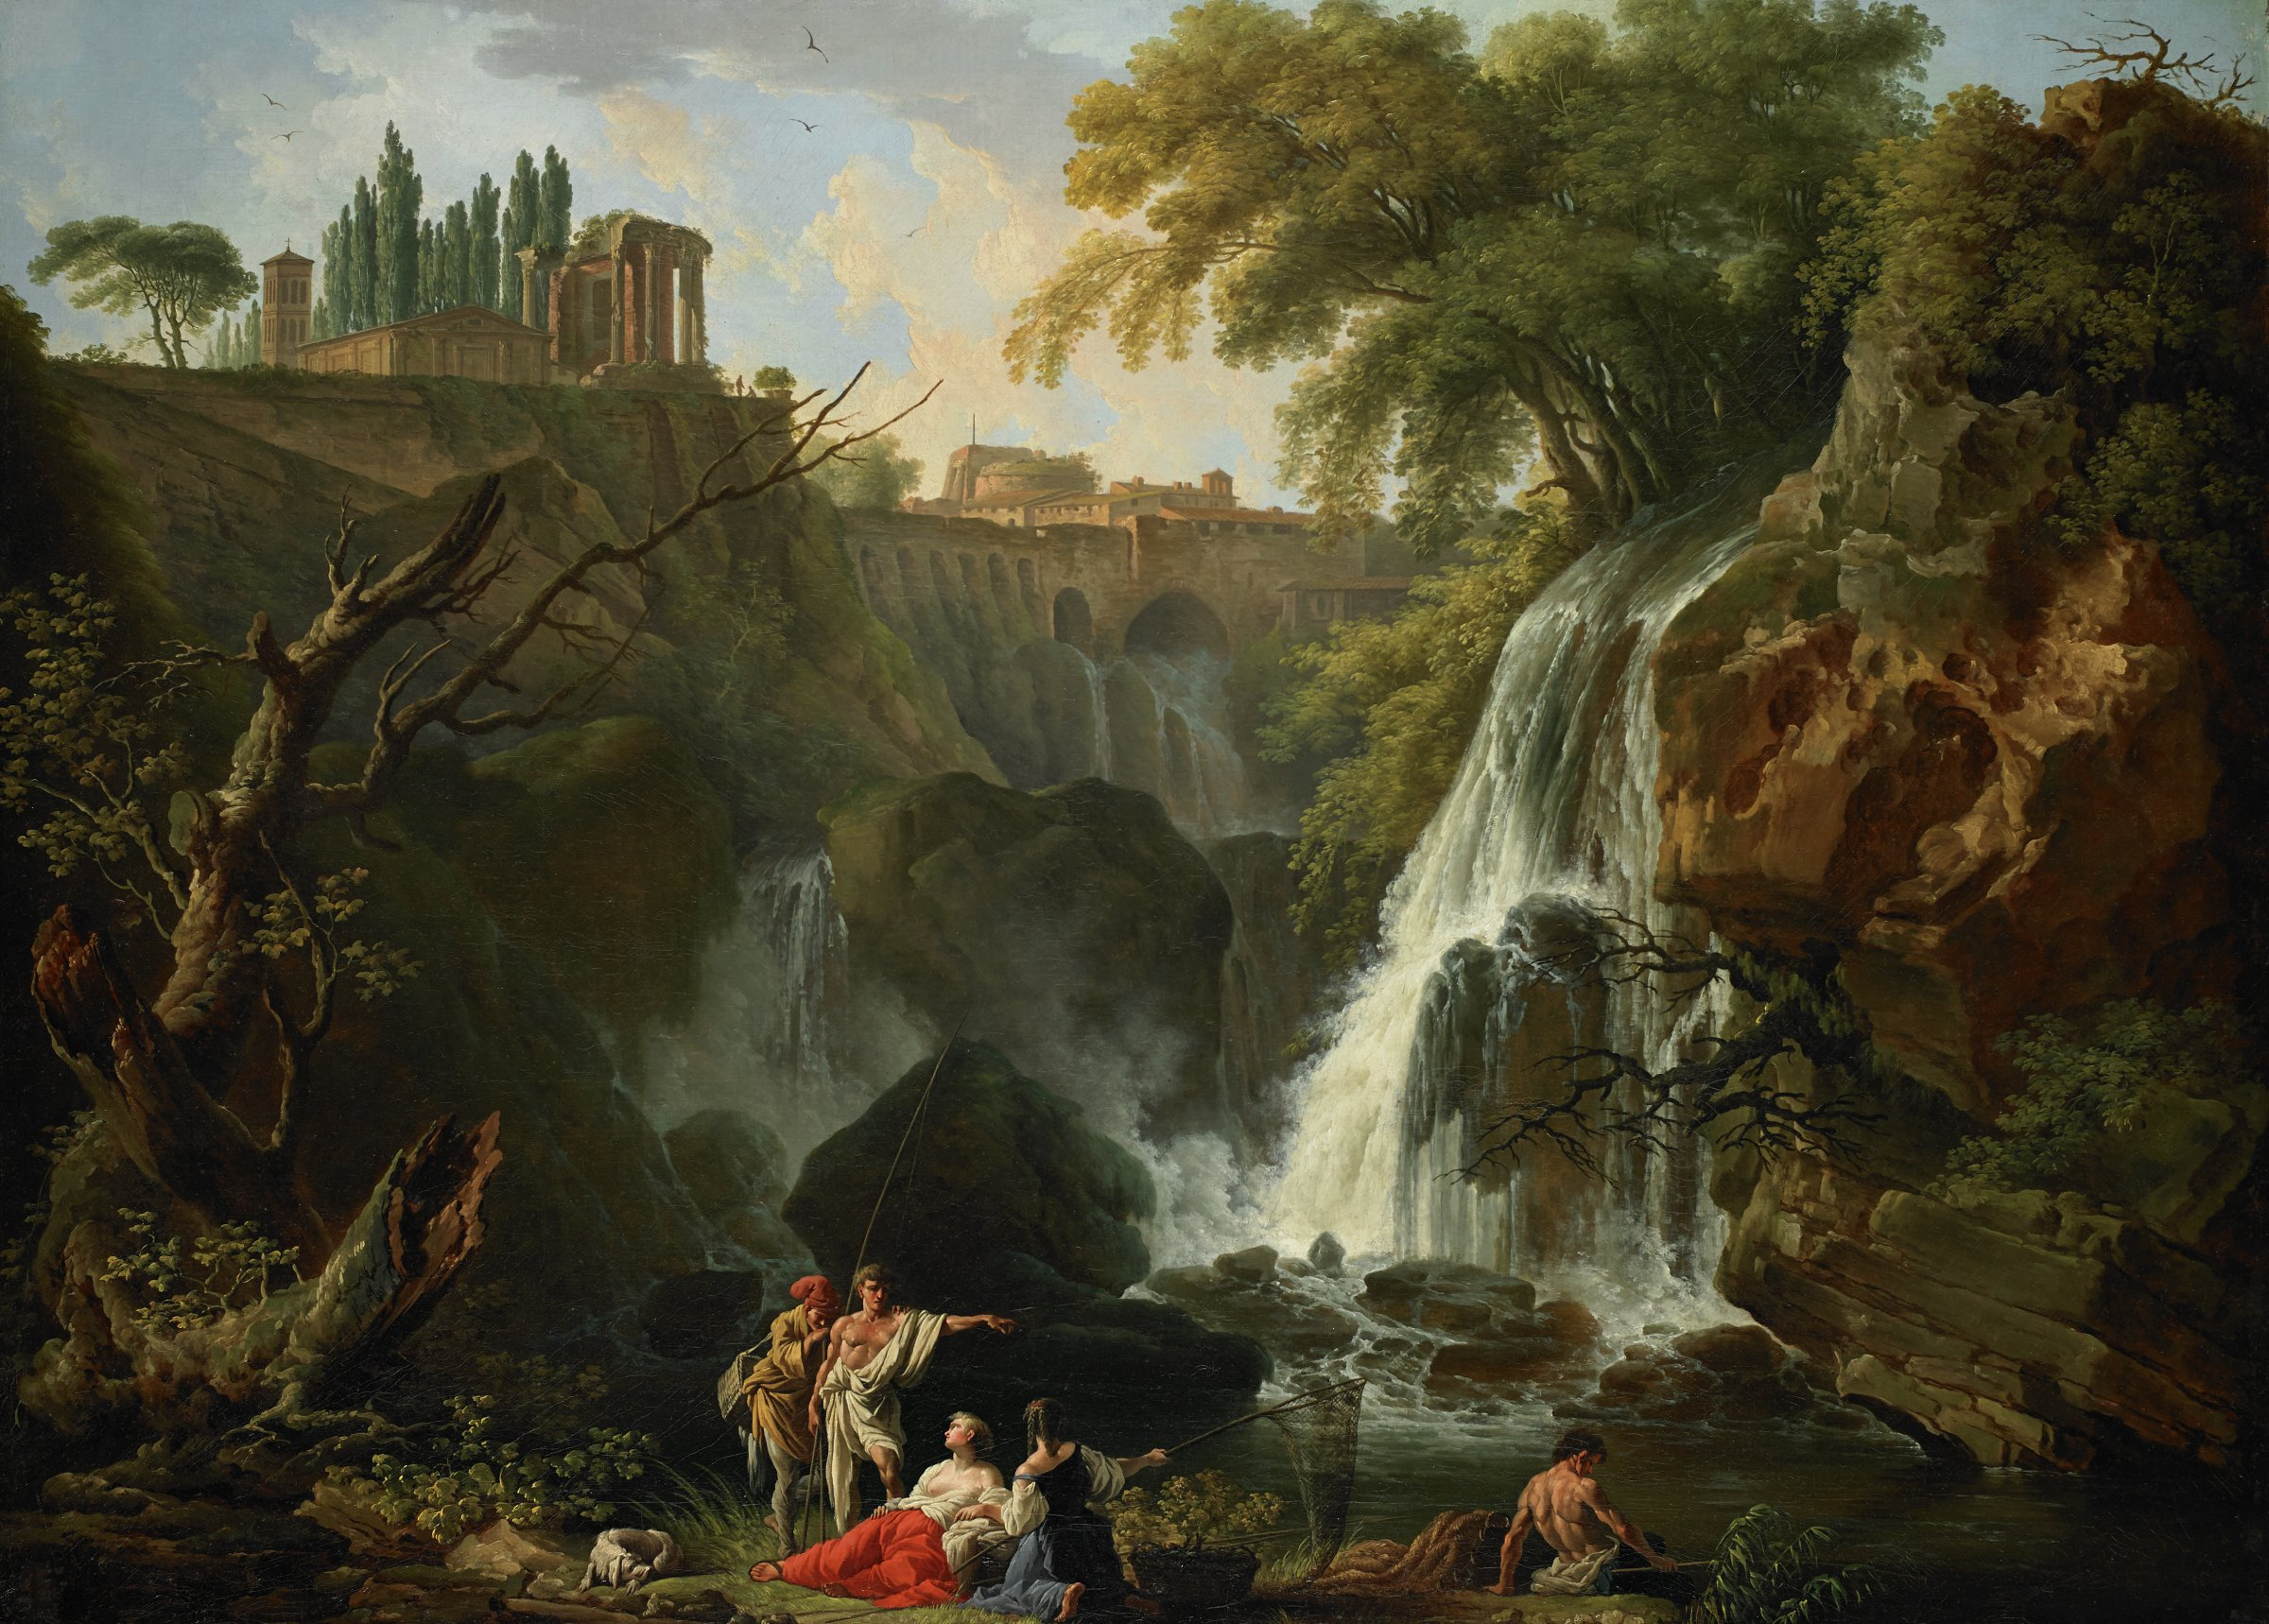 The Cascade at Tivoli, Claude-Joseph Vernet, oil on canvas